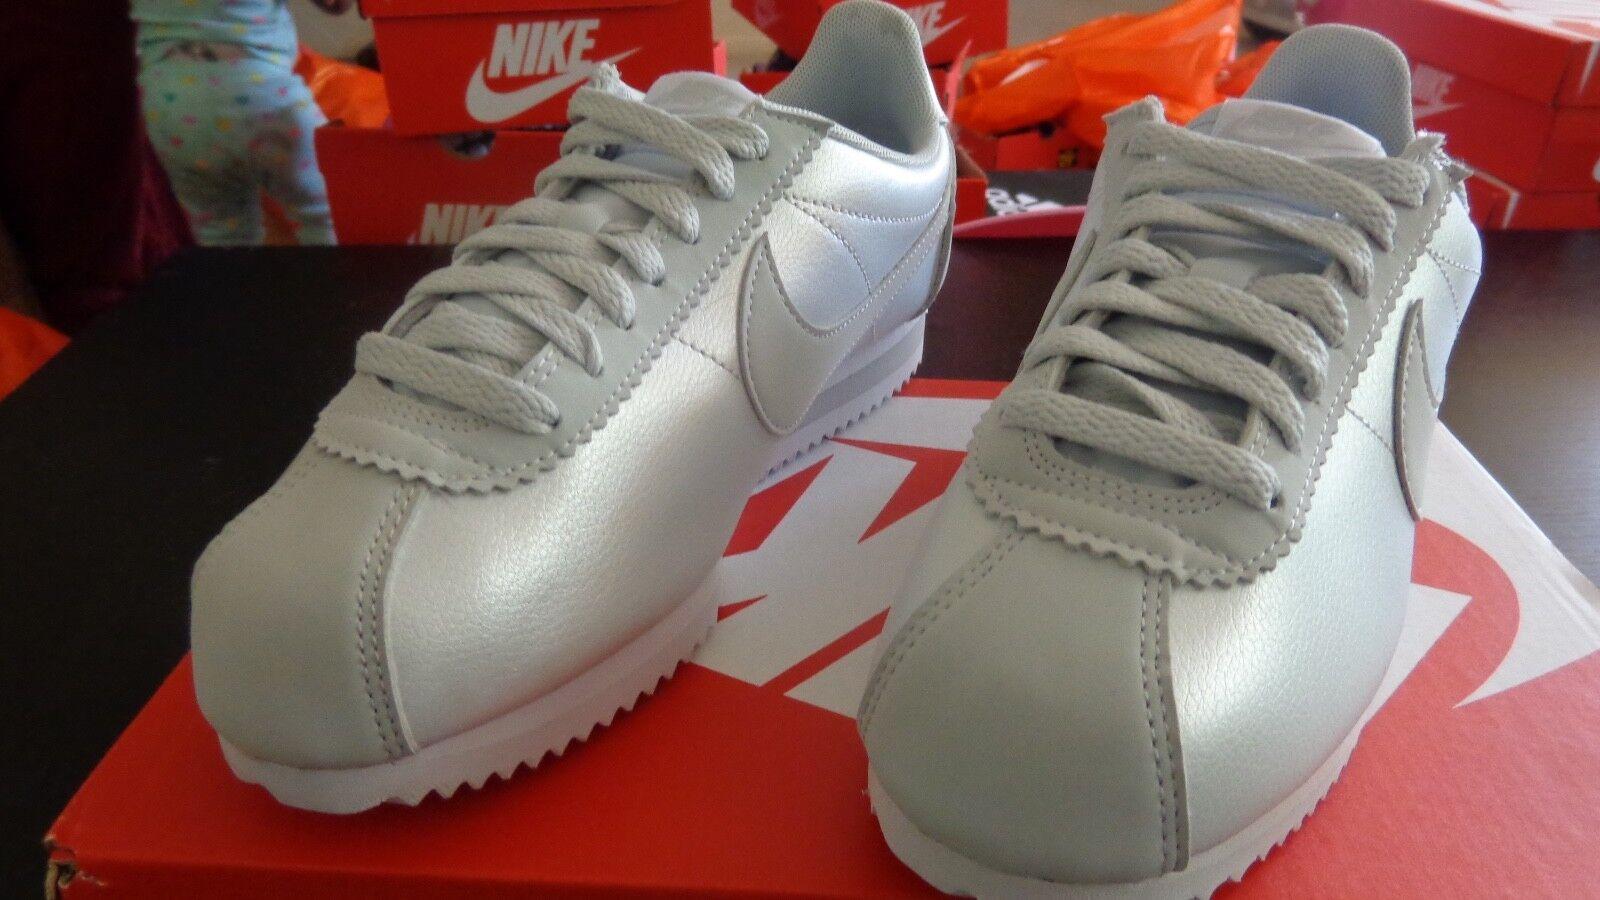 Nike Classic Women Cortez Leather. Women Classic sizes: 6, 7.5, 8 & 9. 8f9d26